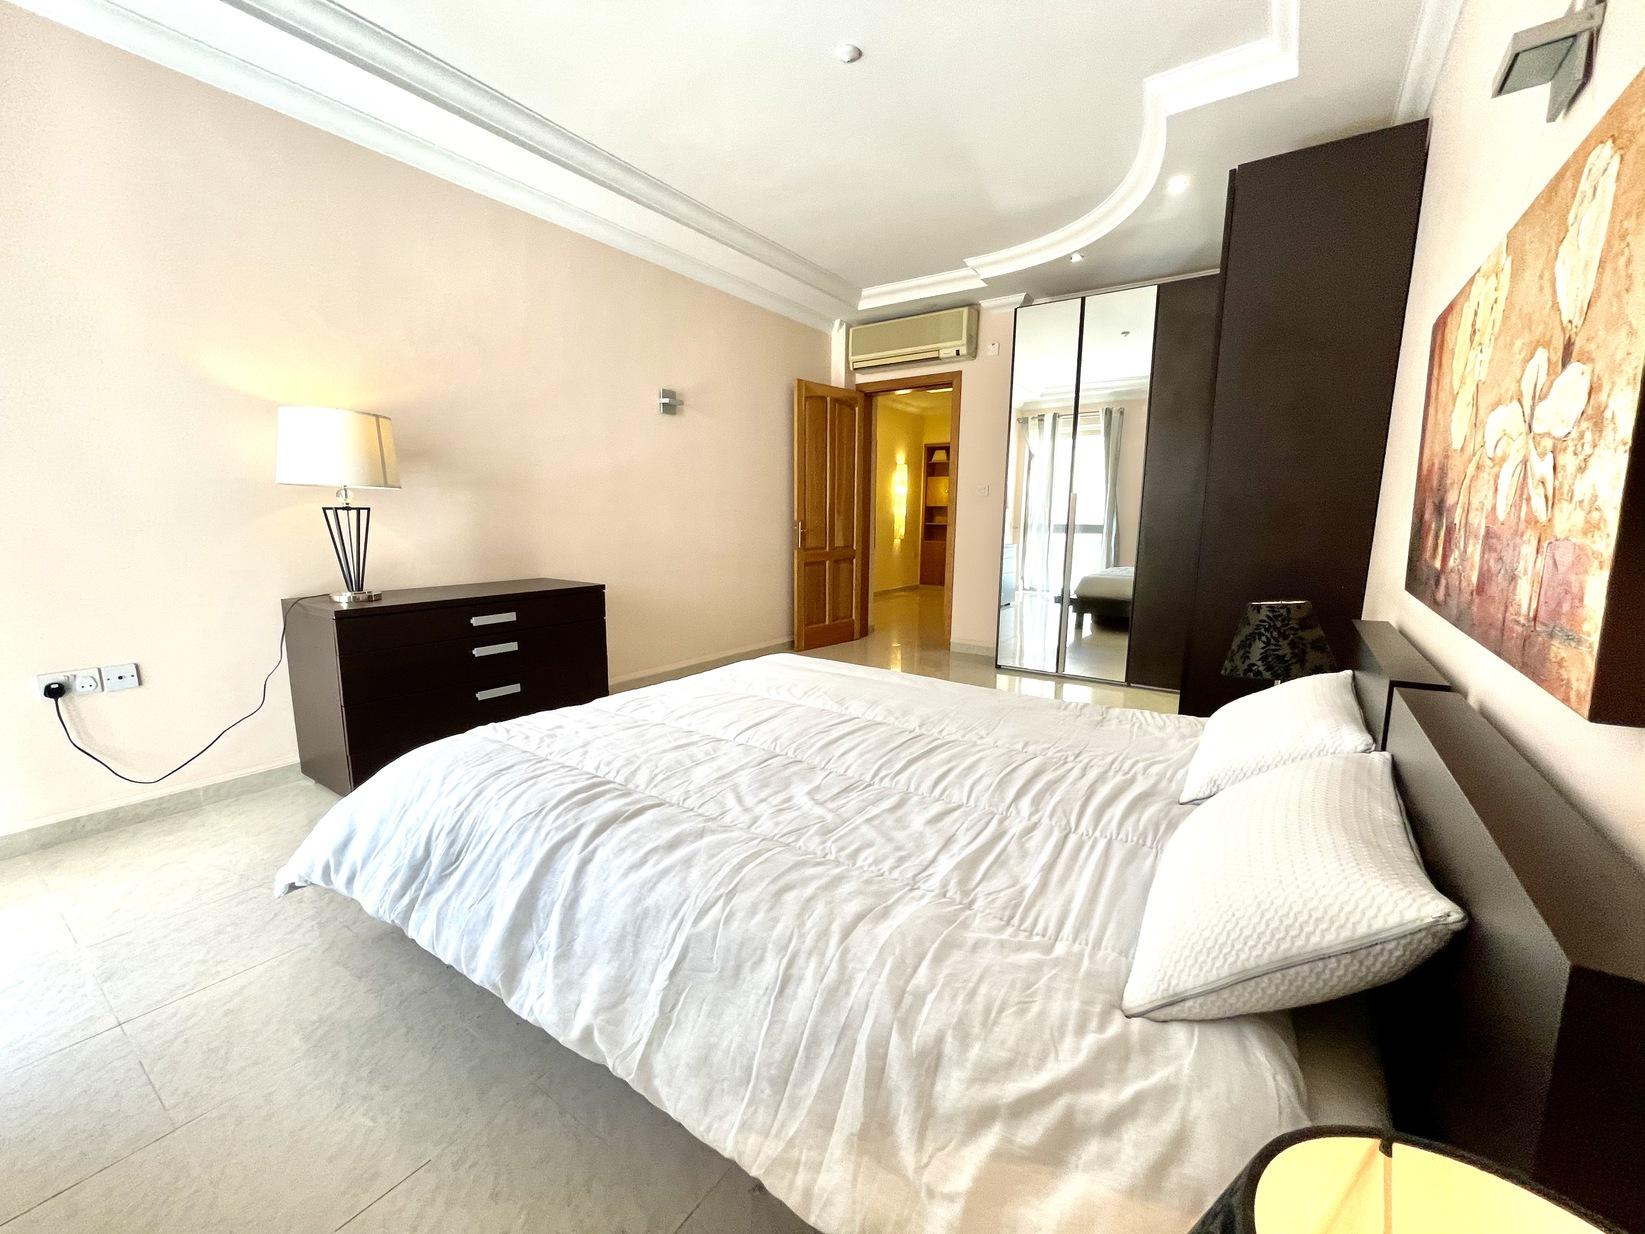 3 bed Apartment For Rent in Sliema, Sliema - thumb 22